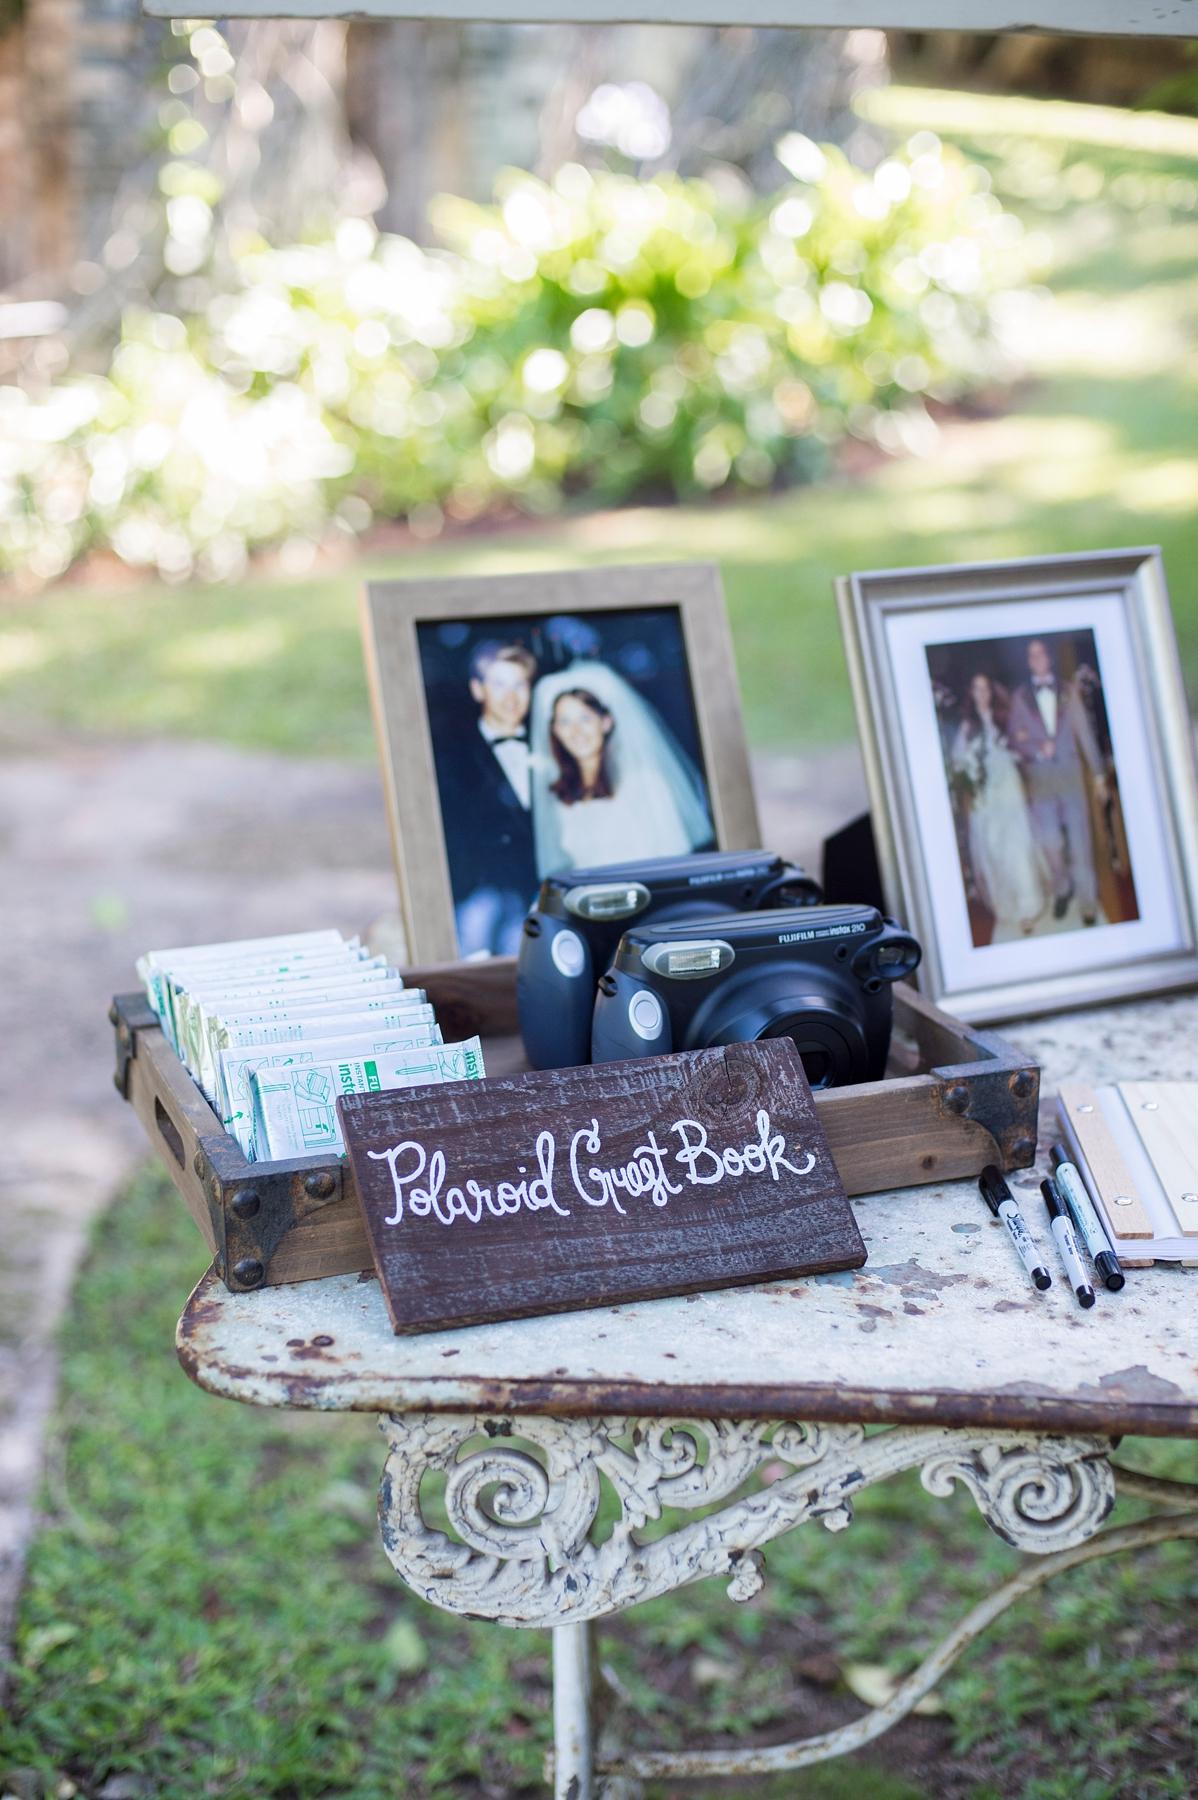 Attractive Nikki Matt Haiku Mill Wedding Trish Barker Photography Wedding Polaroid Guest Book Images Styles Ideas 2018 Polaroid Guest Book Baby Shower Polaroid Guest Book Table photos Polaroid Guest Book